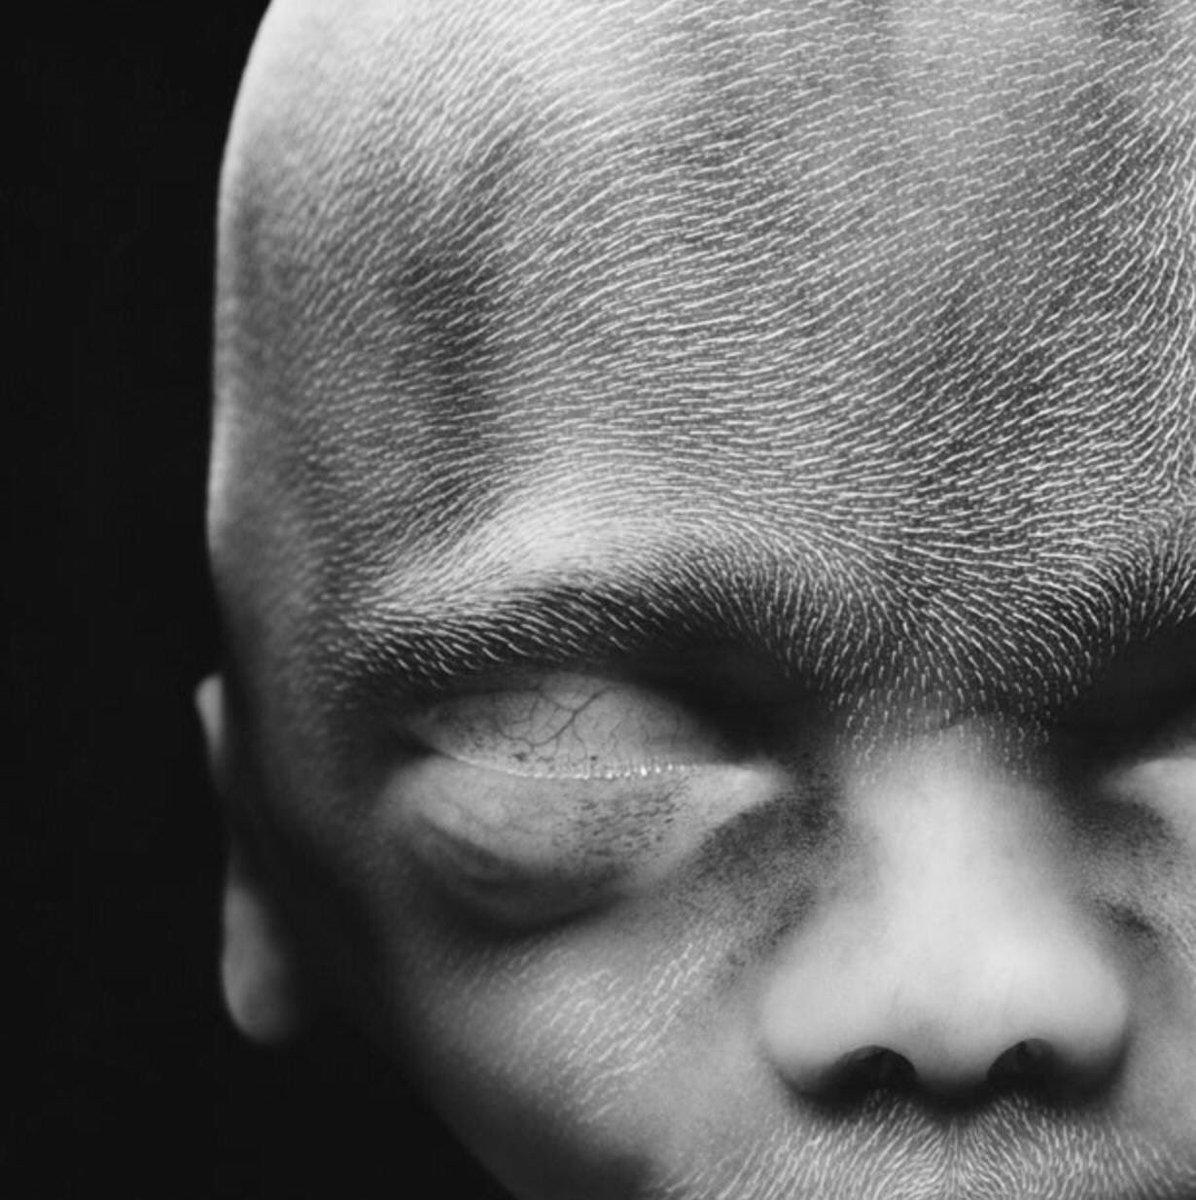 Transfigured to be authentic | America Magazine